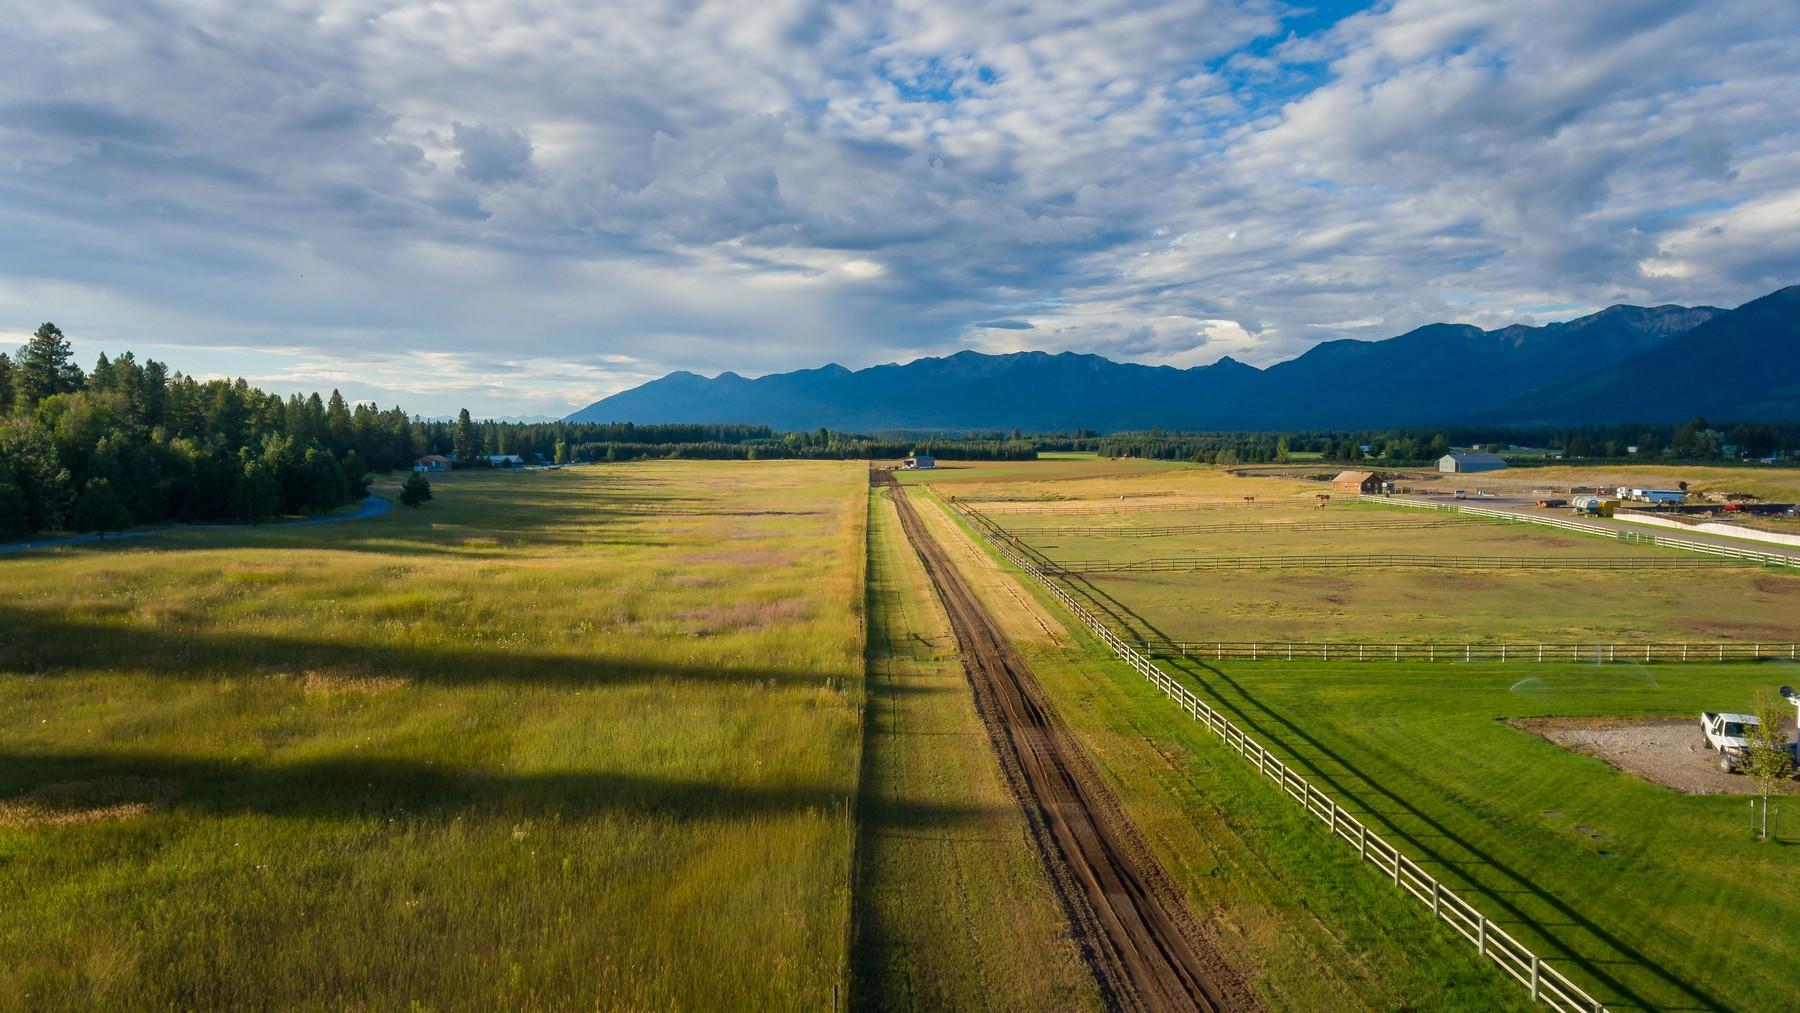 Additional photo for property listing at 201 Hill Rd , Bigfork, MT 59911 201  Hill Rd Bigfork, Montana 59911 United States